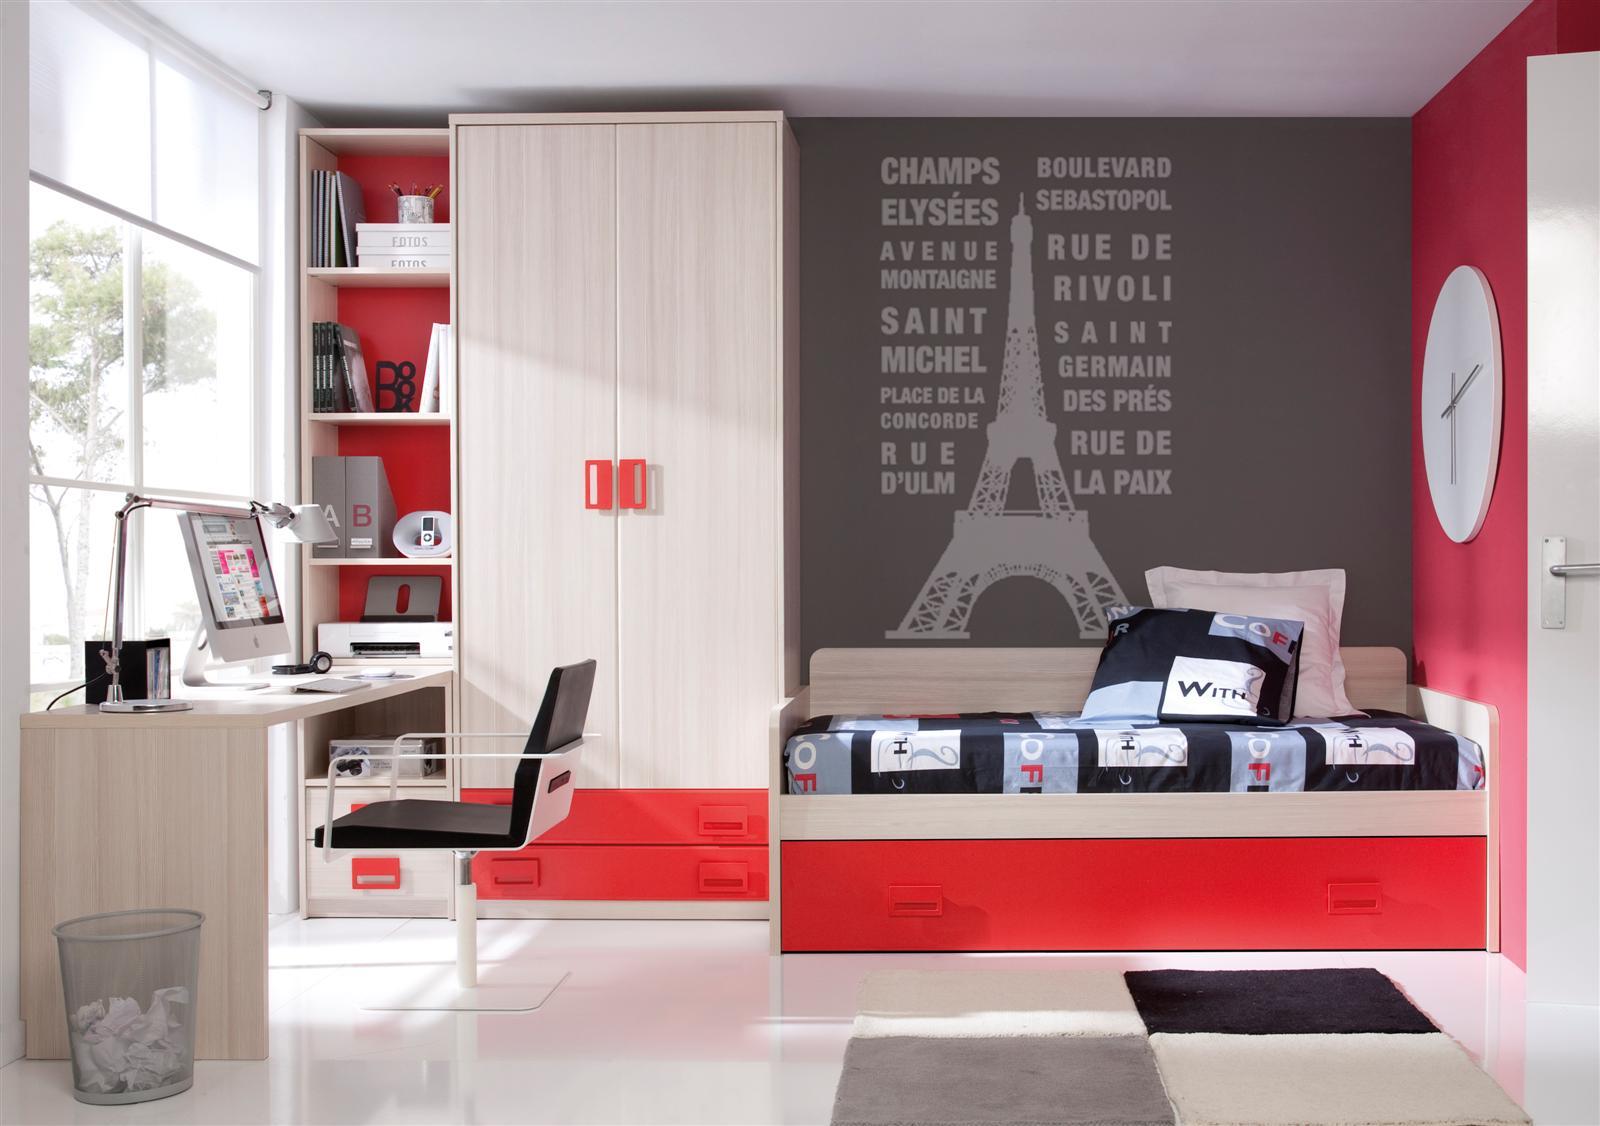 cuisine equipee a prix discount. Black Bedroom Furniture Sets. Home Design Ideas